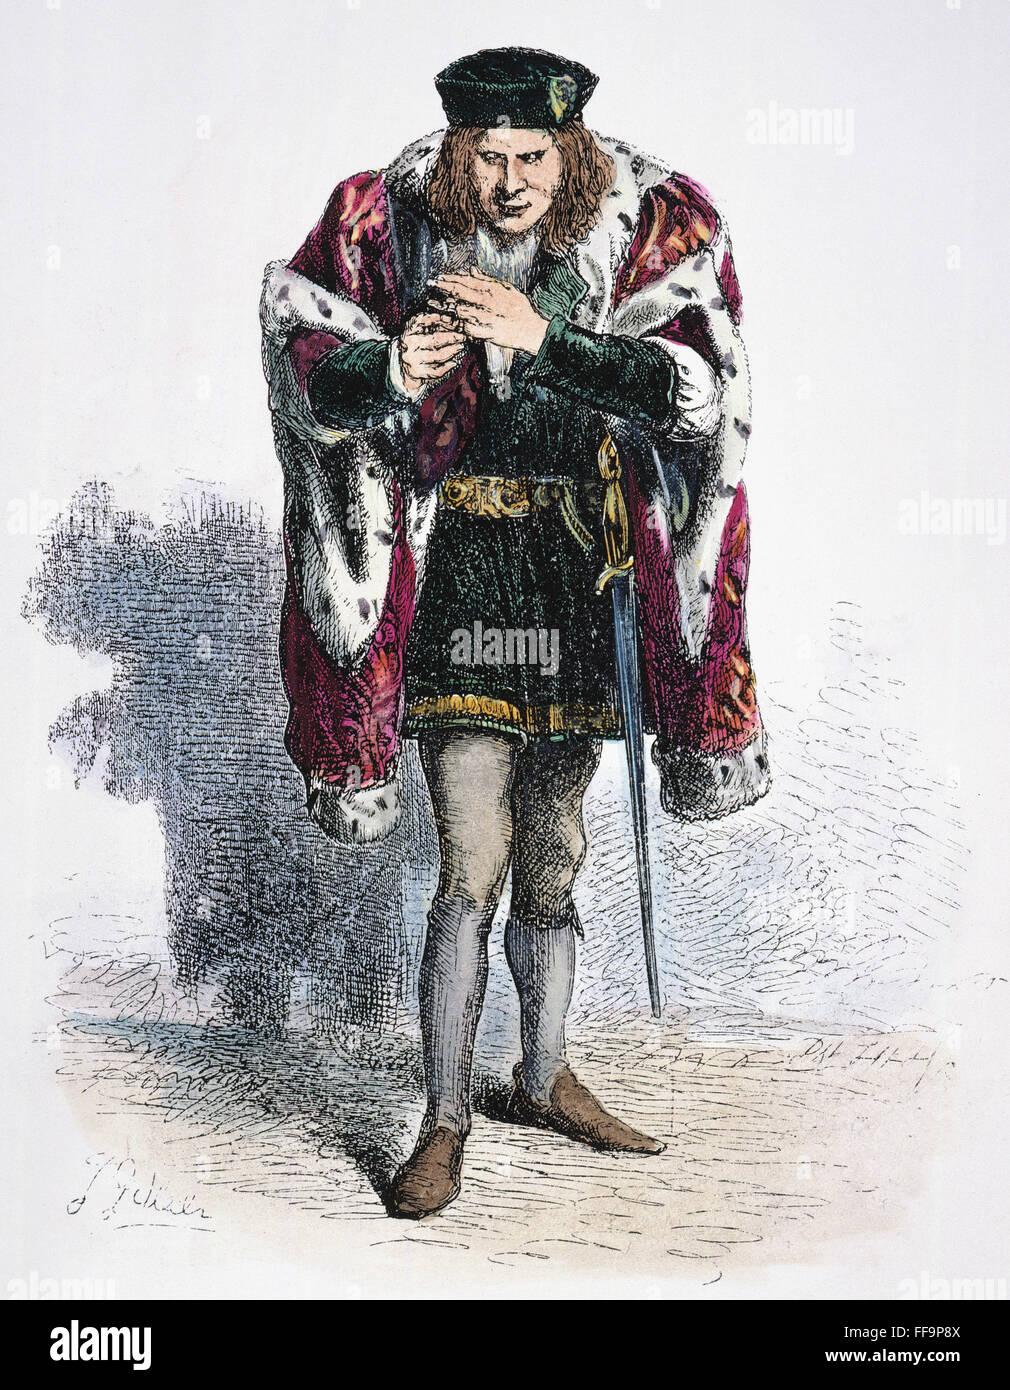 Shakespeare Richard Iii Nking Richard Iii In Act 1 Scene